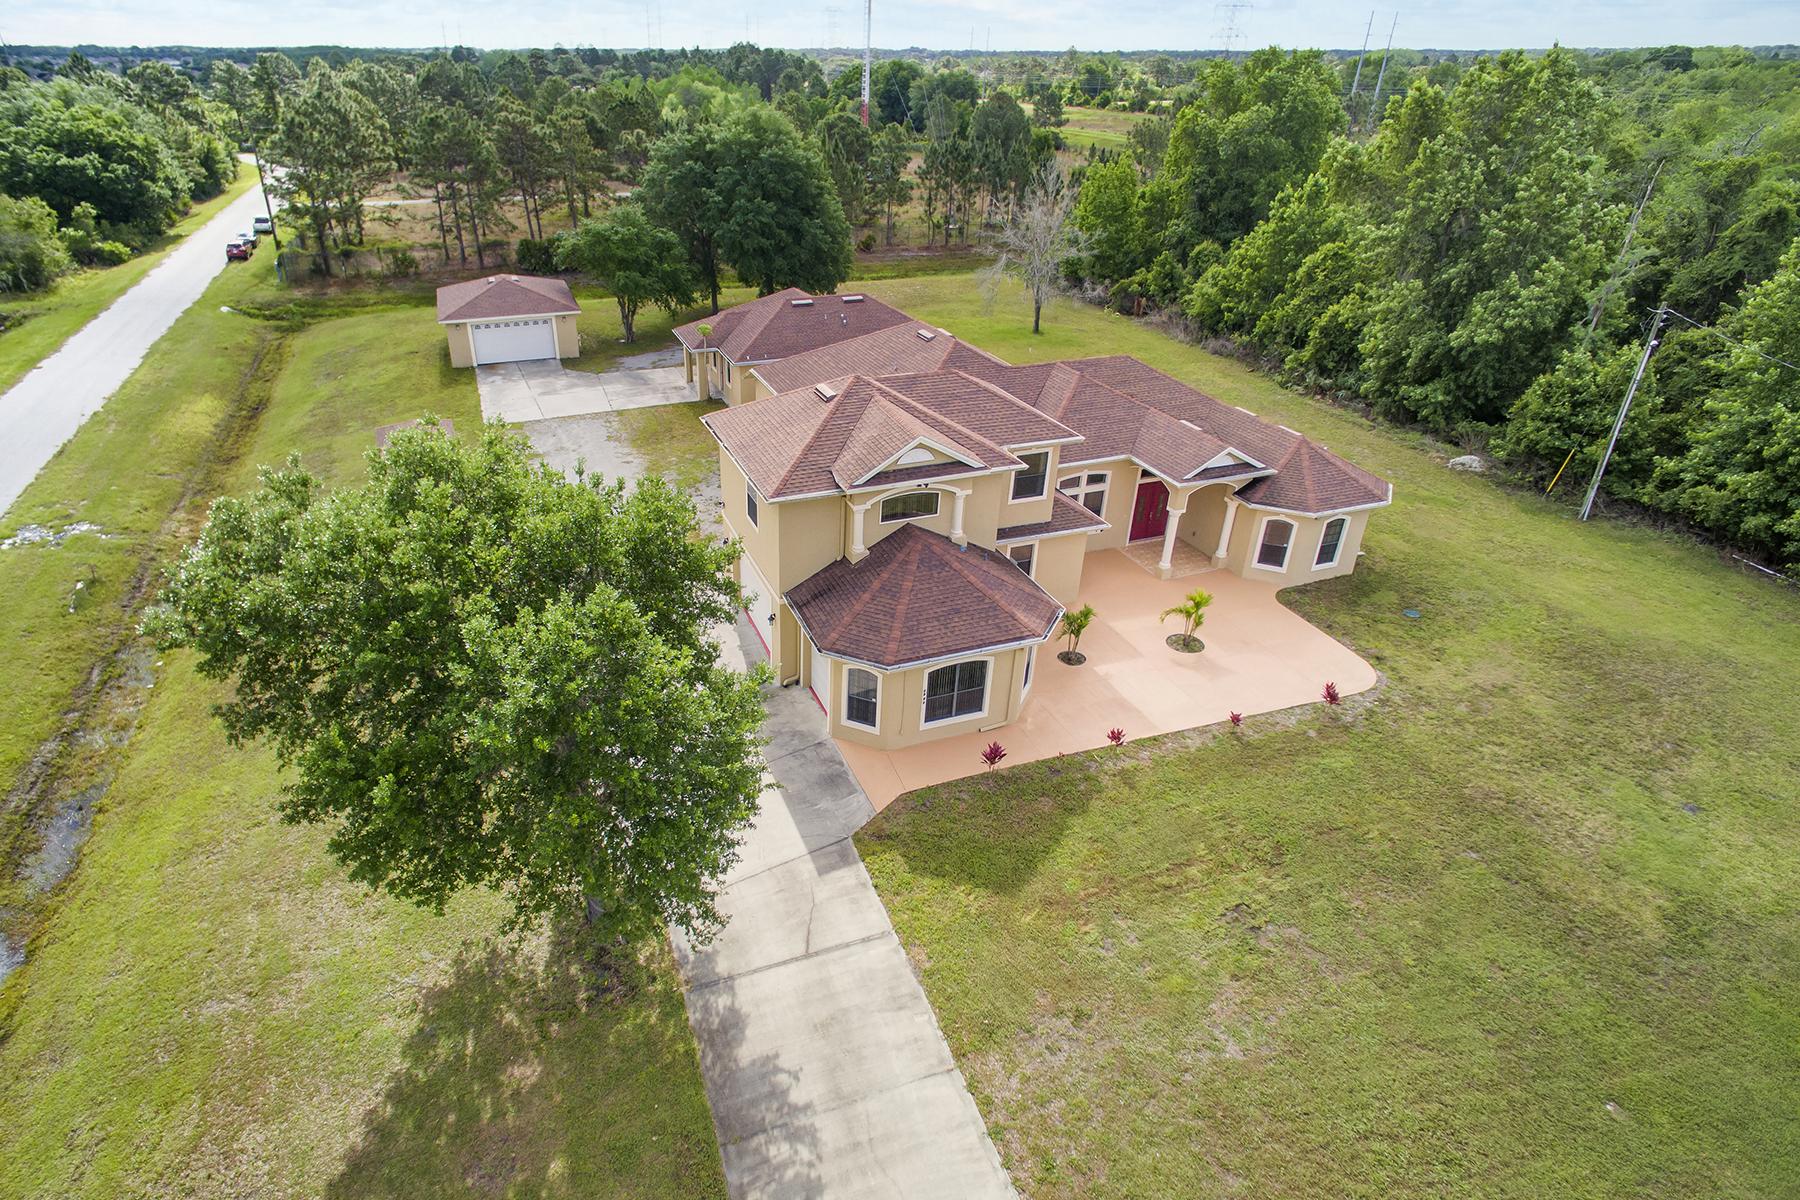 Single Family Home for Sale at Orlando, Florida 2843 Dallas Blvd Orlando, Florida, 32833 United States